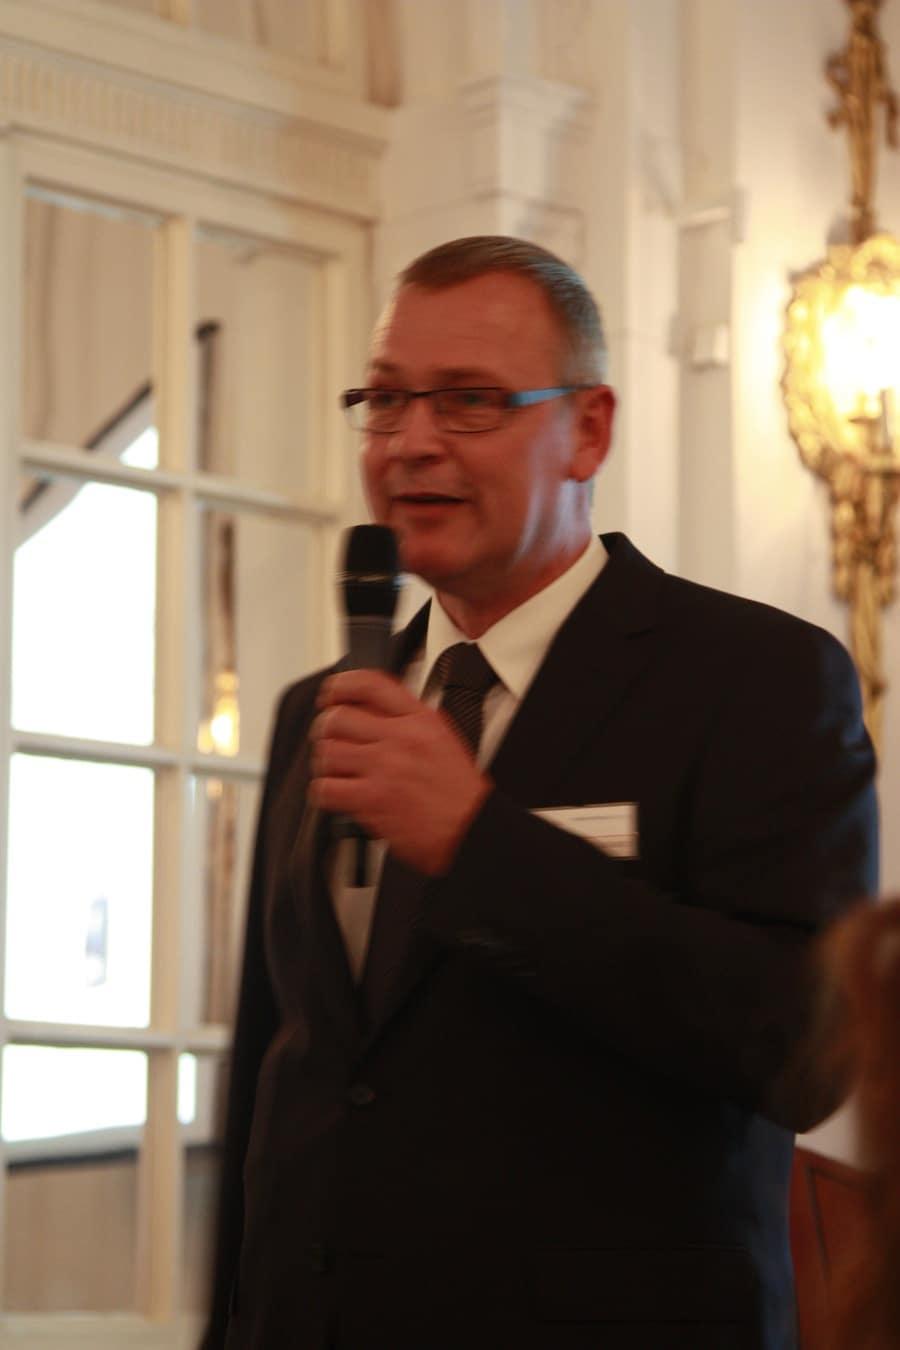 Jens Gerlach